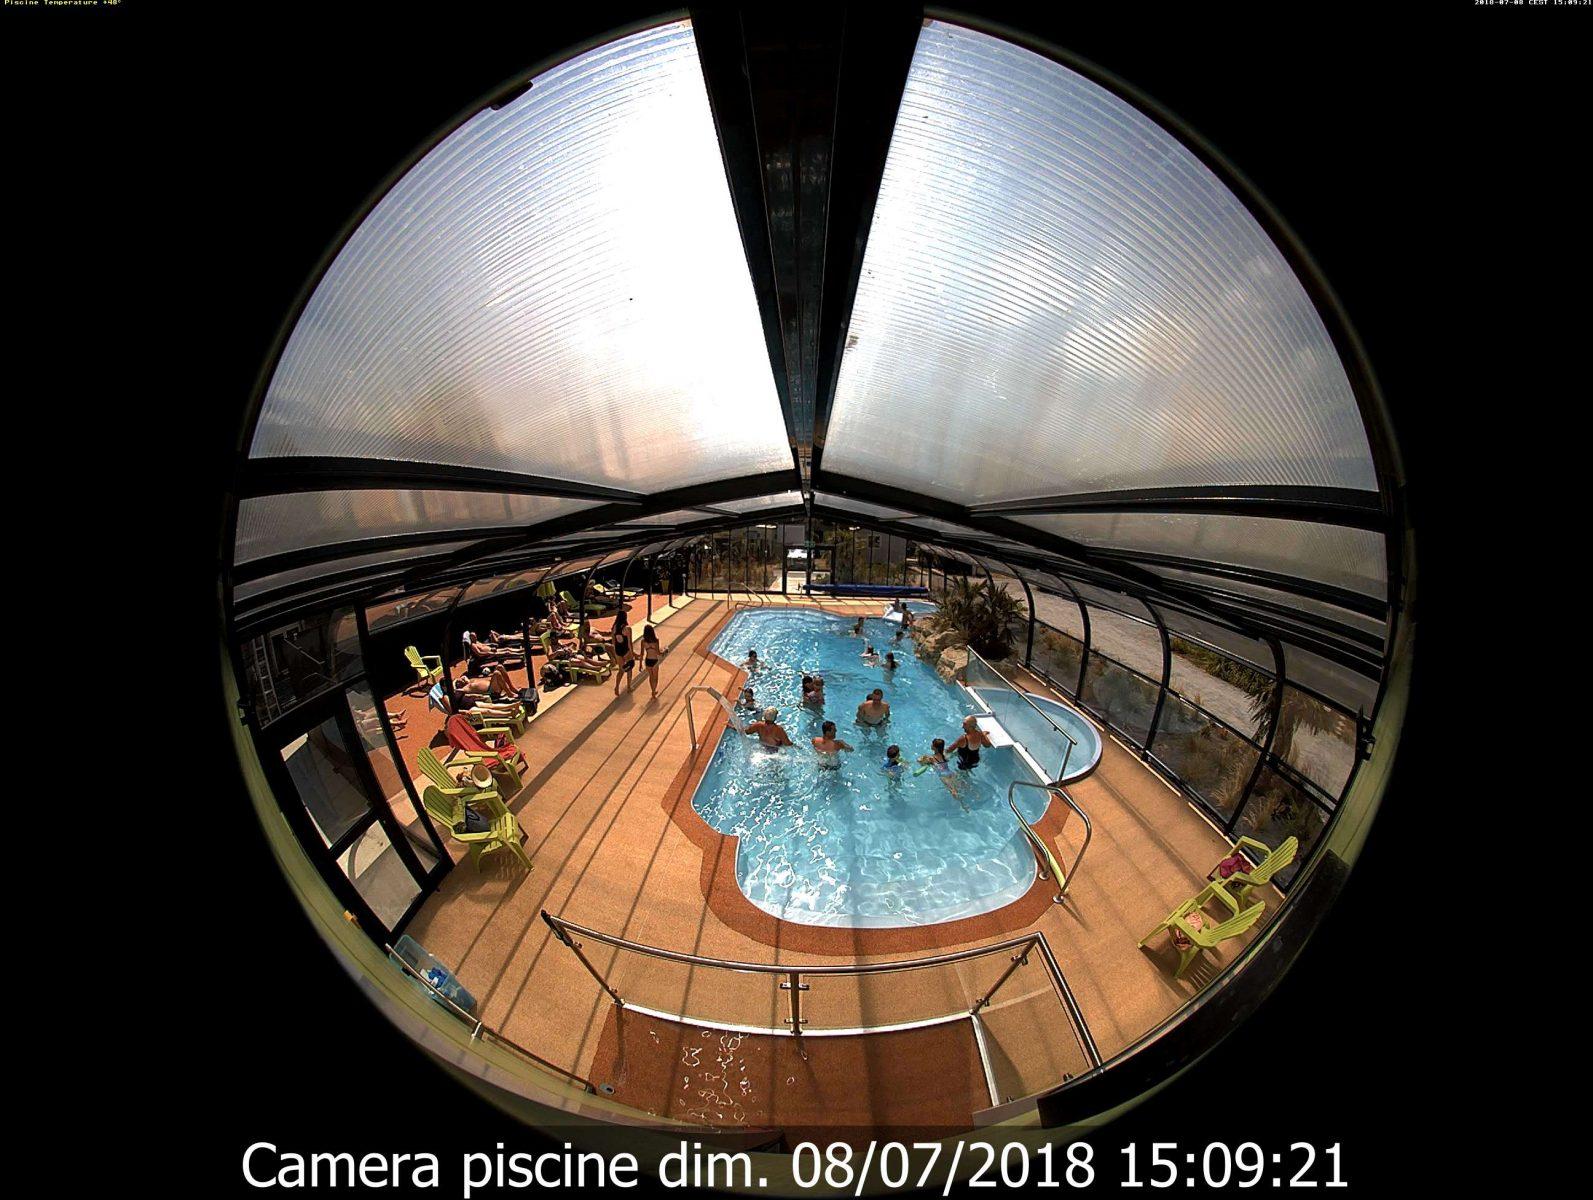 Camera piscine 2018-07-08 15-09-21